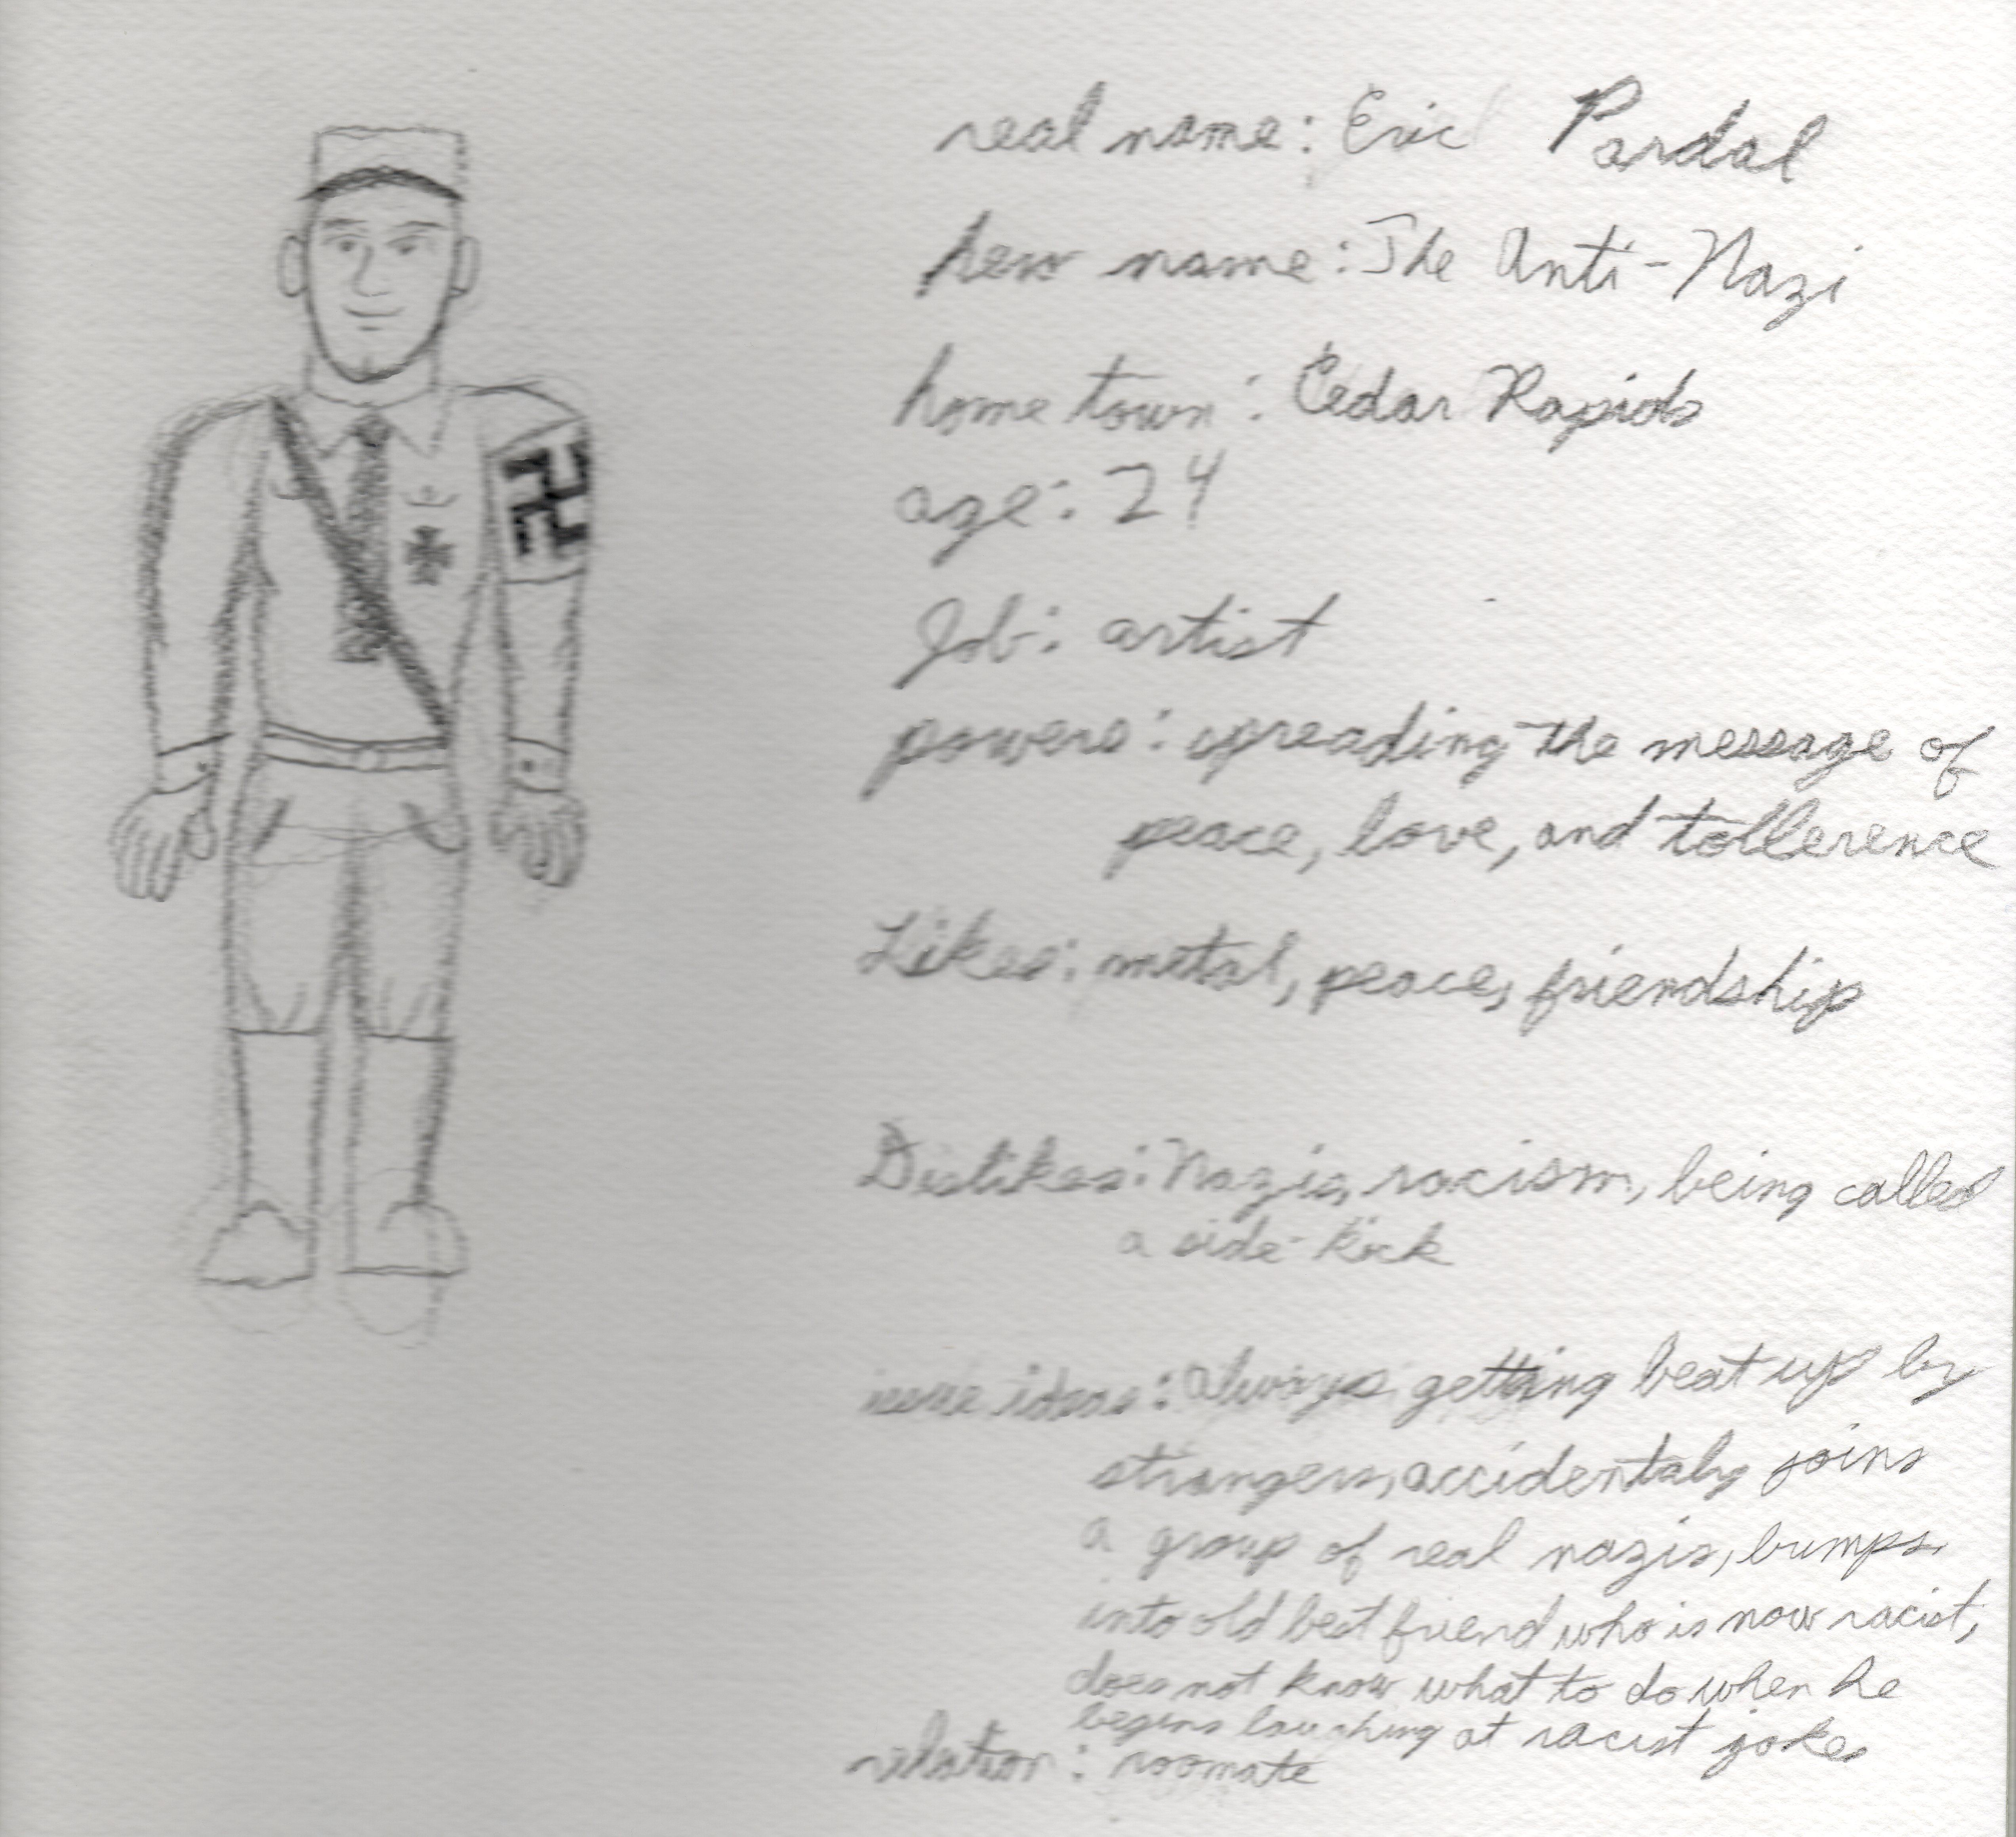 The Original Drawing of The Anti-Nazi